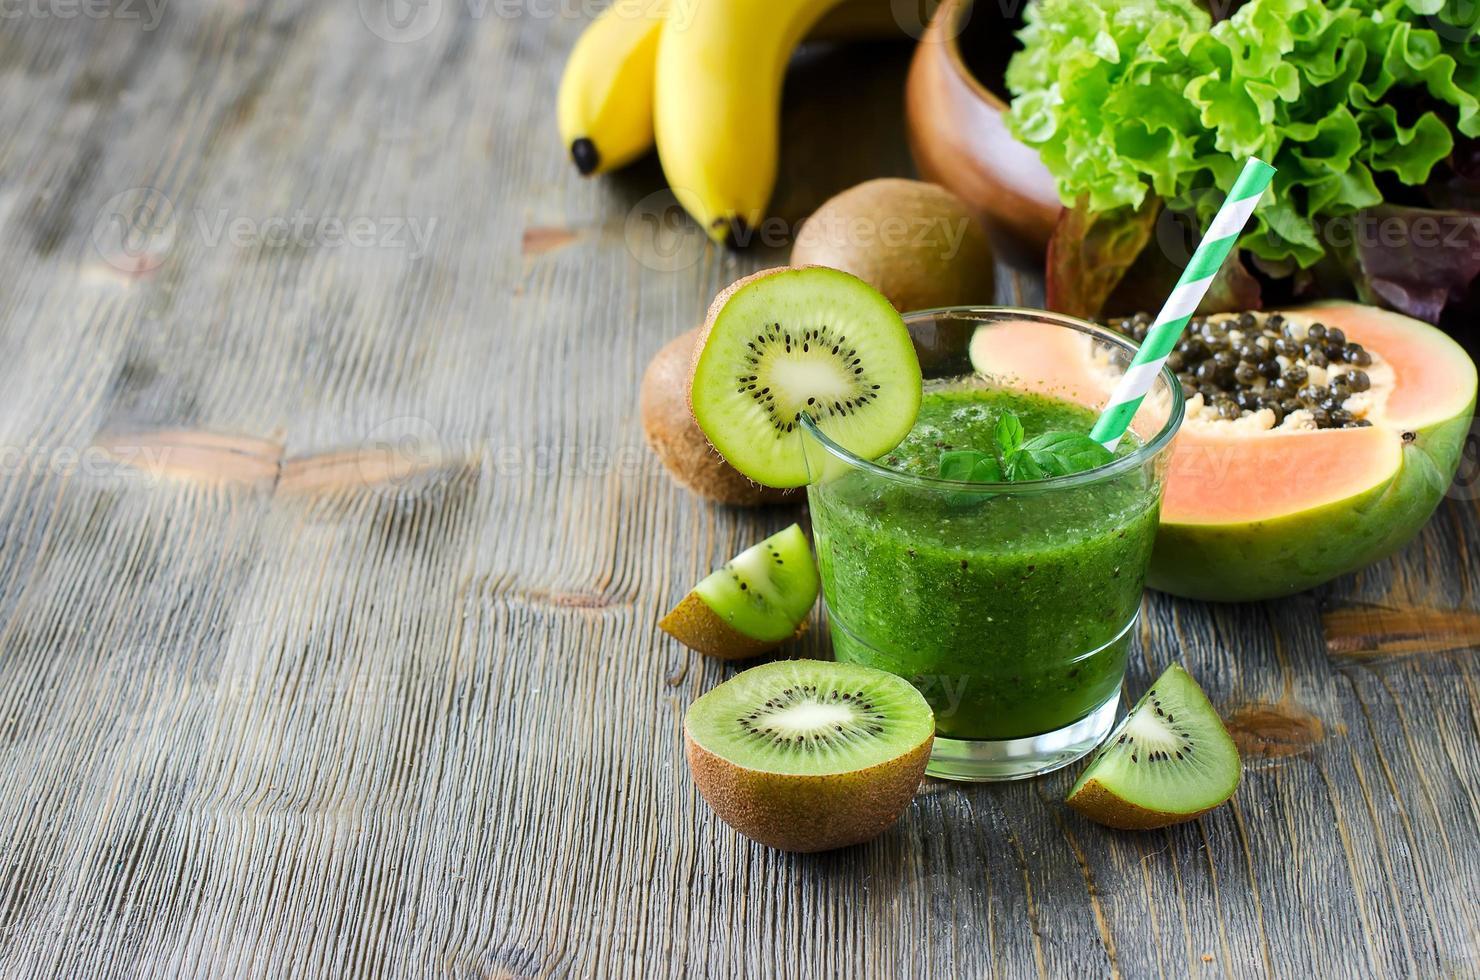 groene smoothie met kiwi, papaja en salade bladeren kopiëren ruimte foto